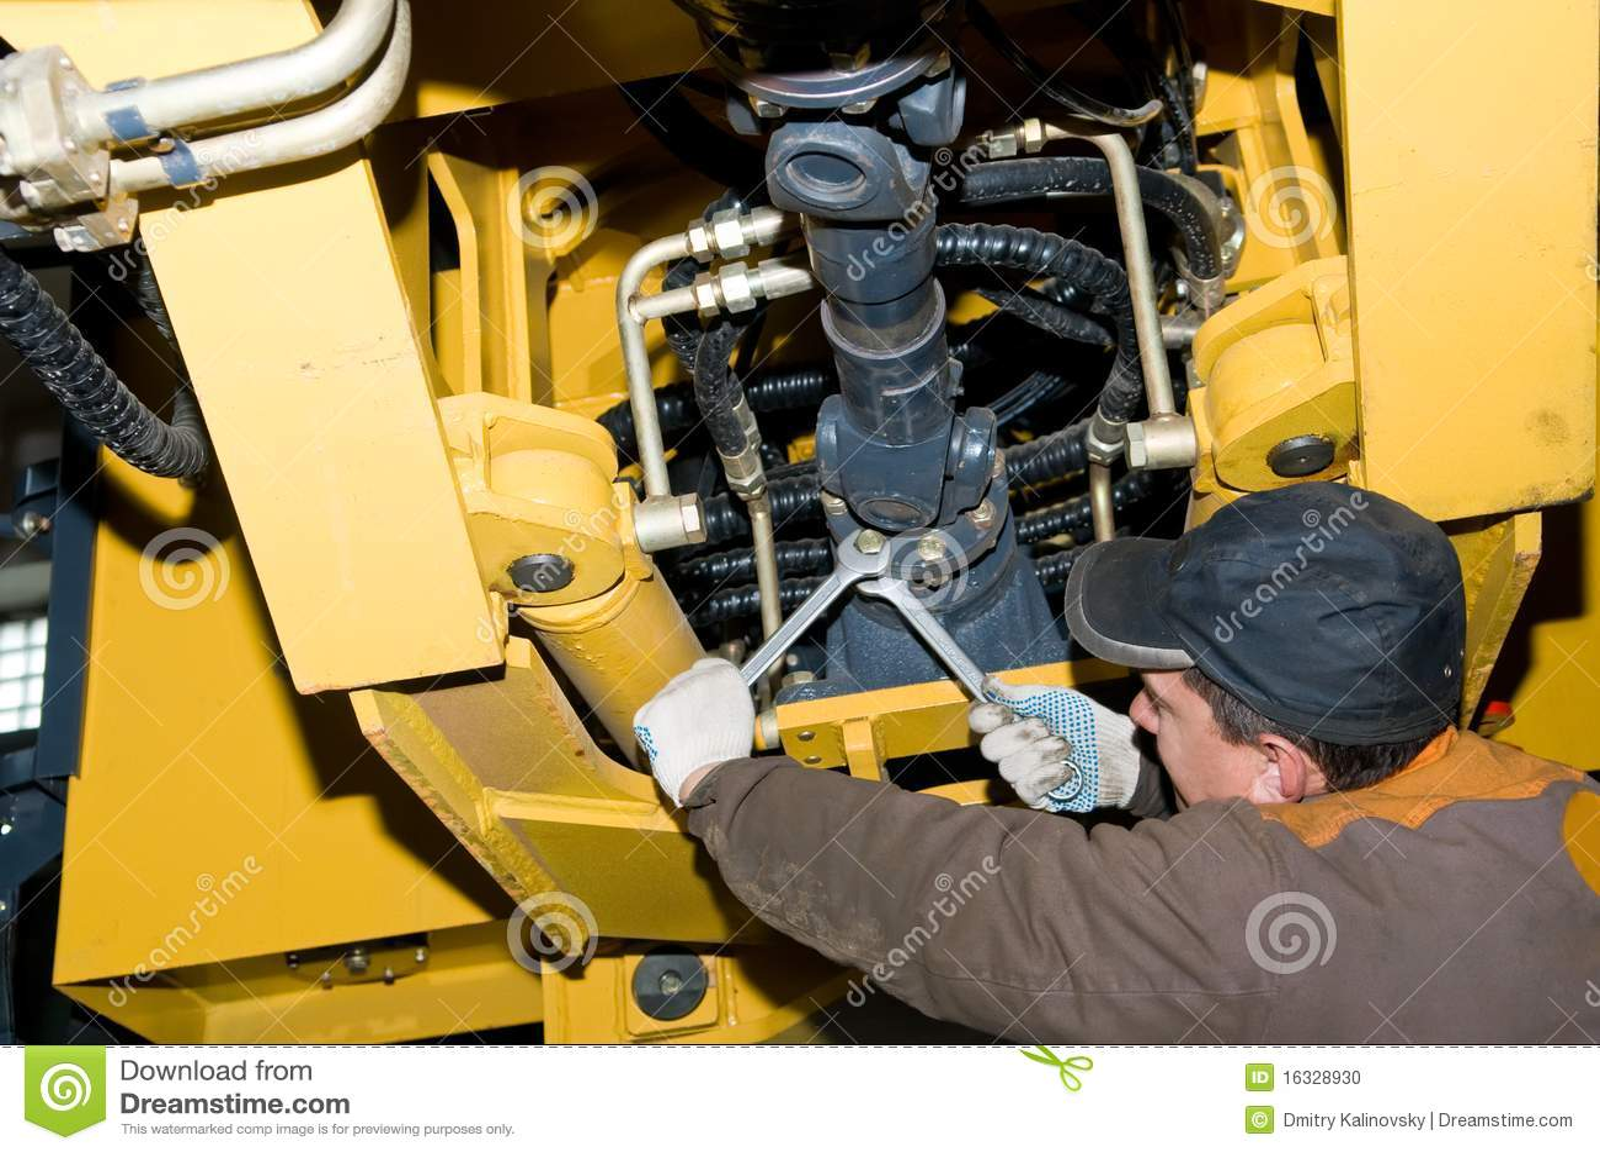 Heavy Equipment Maintenance : Heavy maintenance stock photo cartoondealer